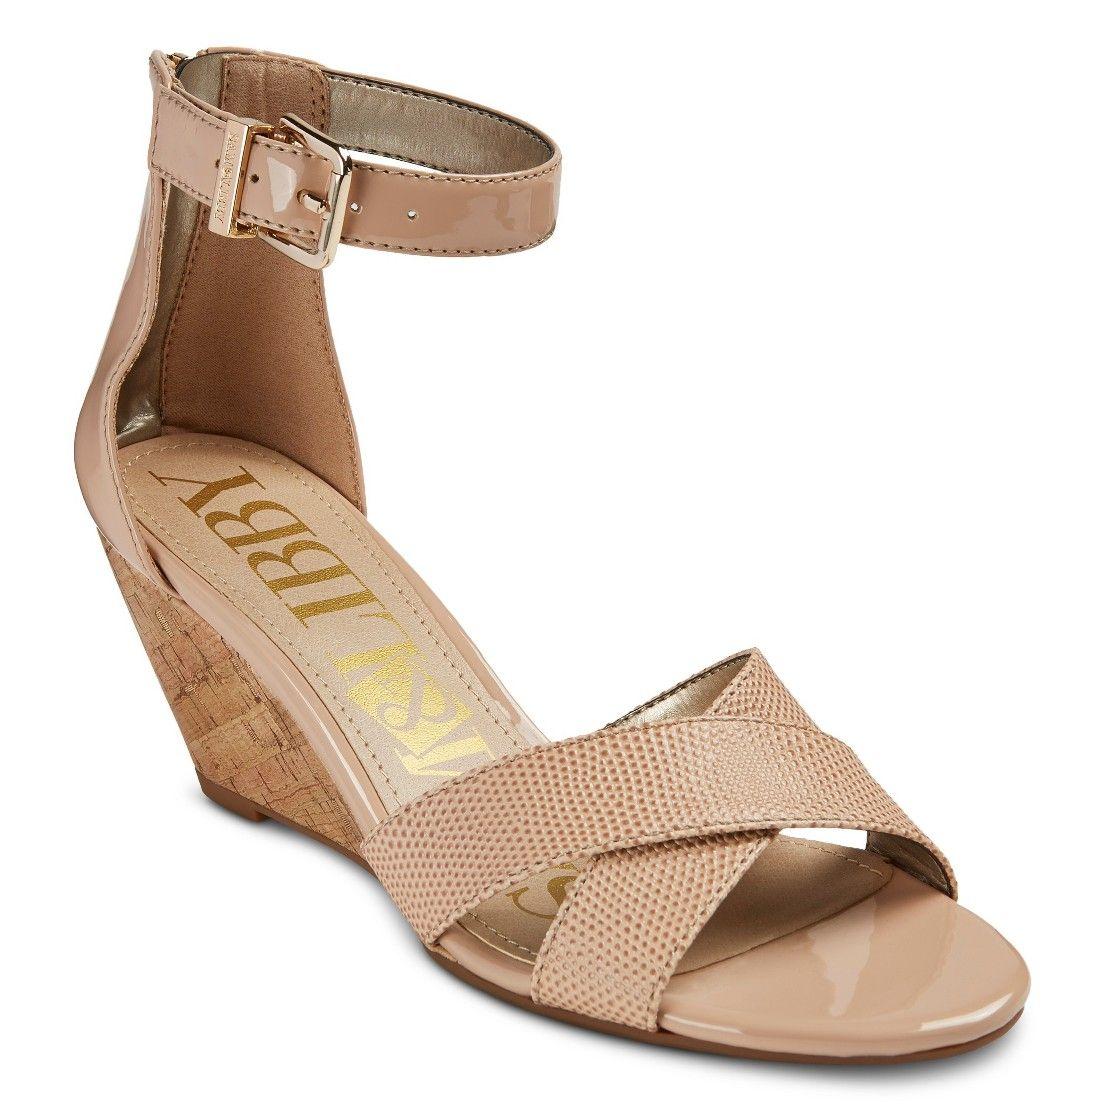 Inspirational Gold Sandals at Target